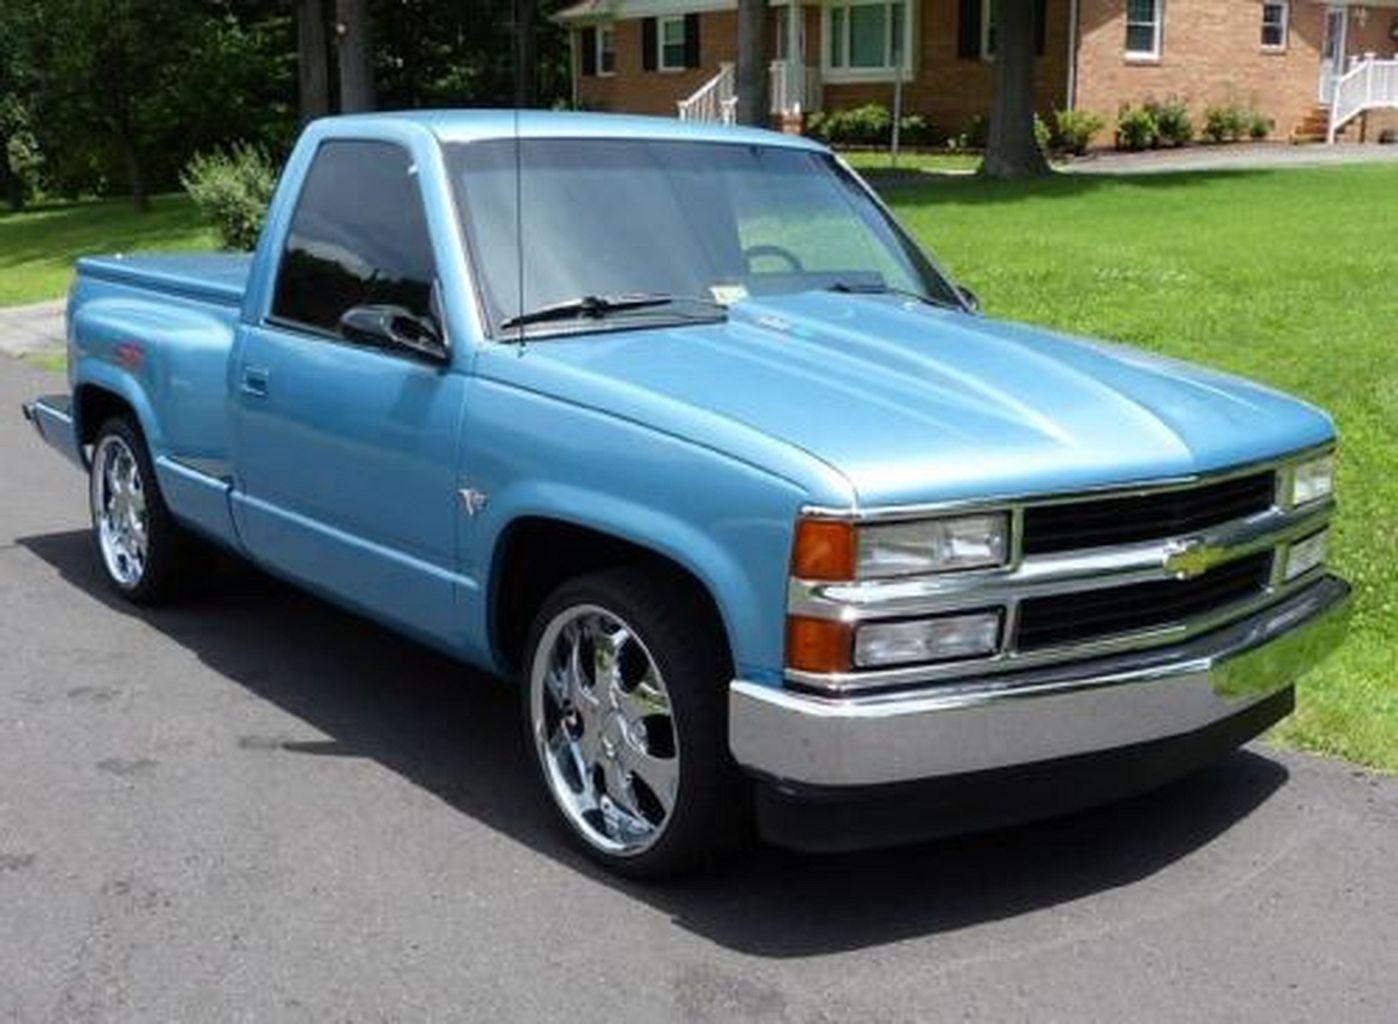 1990 blue chevy silverado truck, California 2013 | Pickup trucks ...